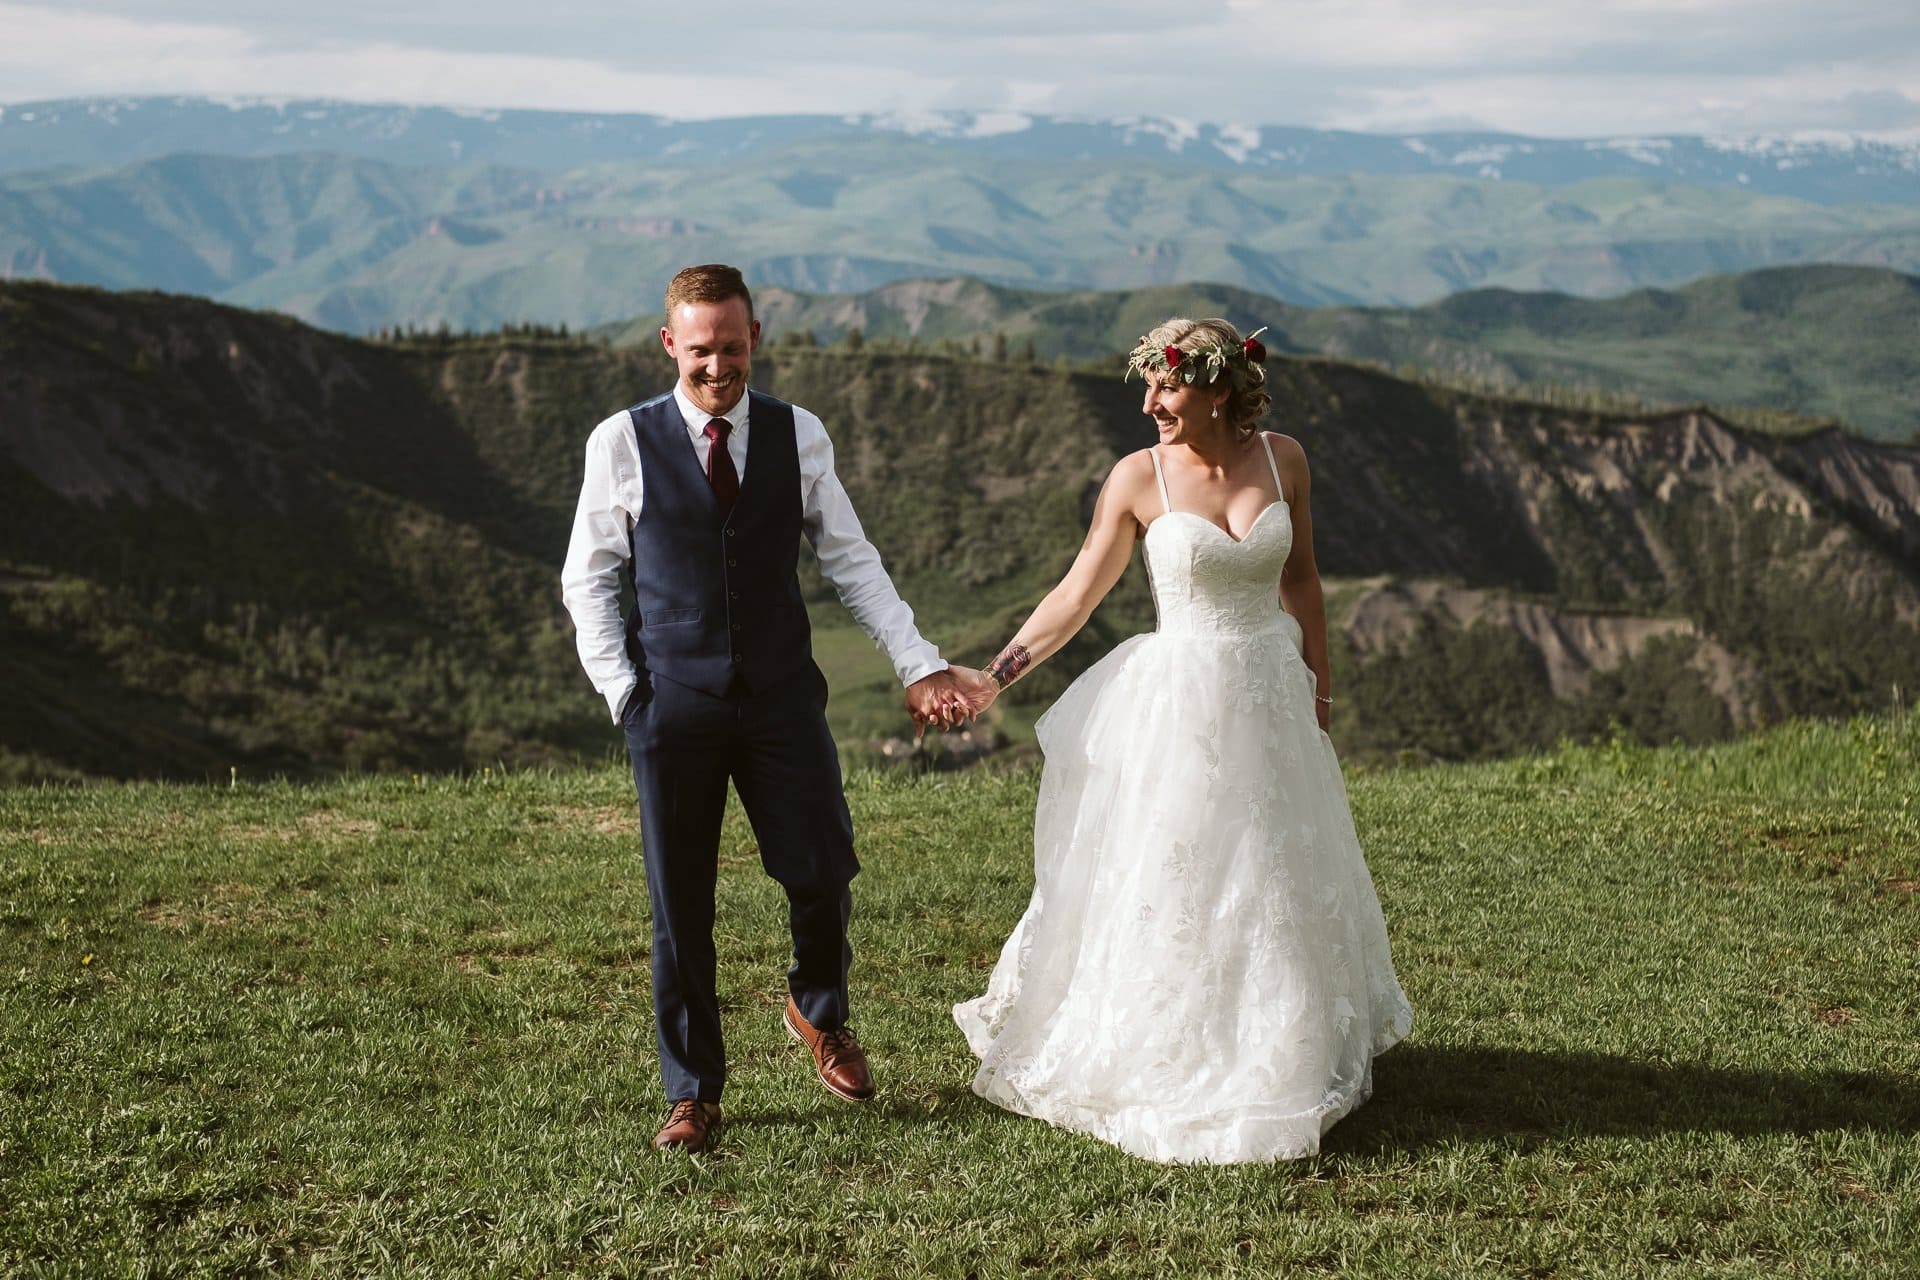 Lynn Britt Cabin wedding reception in Aspen Snowmass